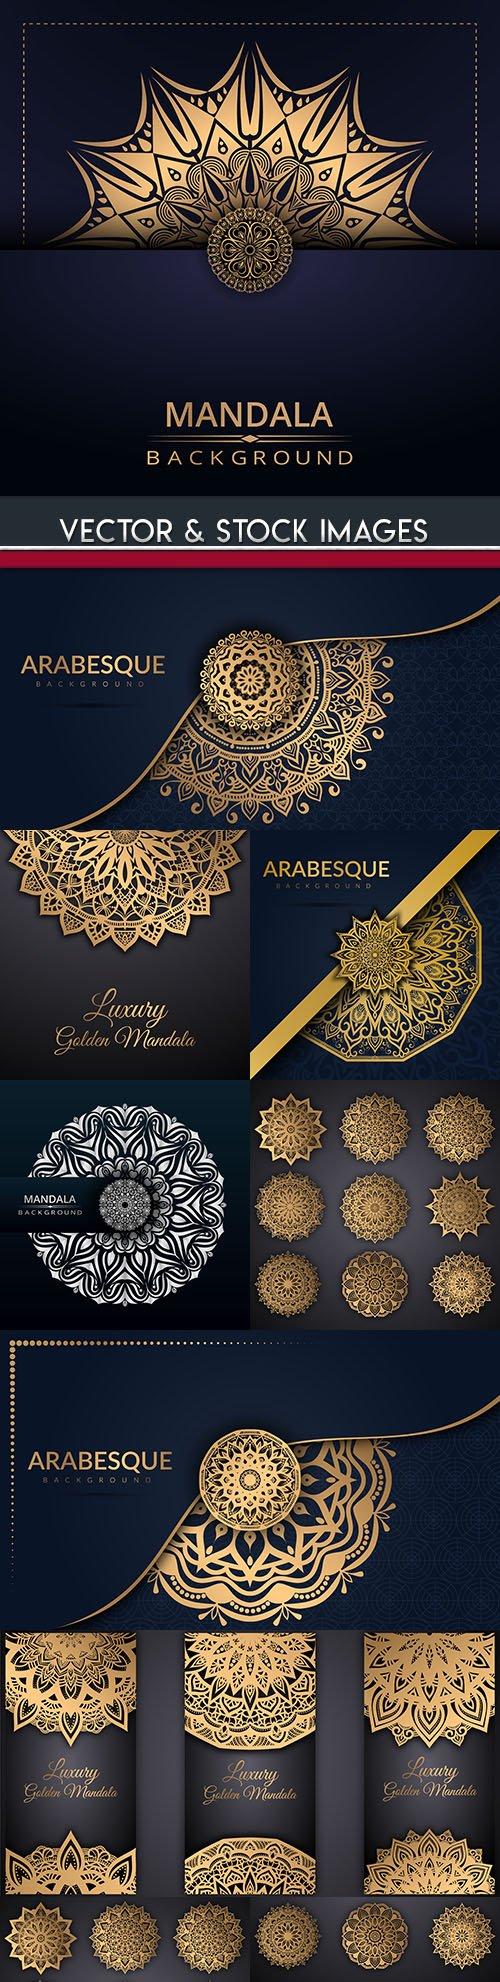 Mandala gold decorative ornament design background